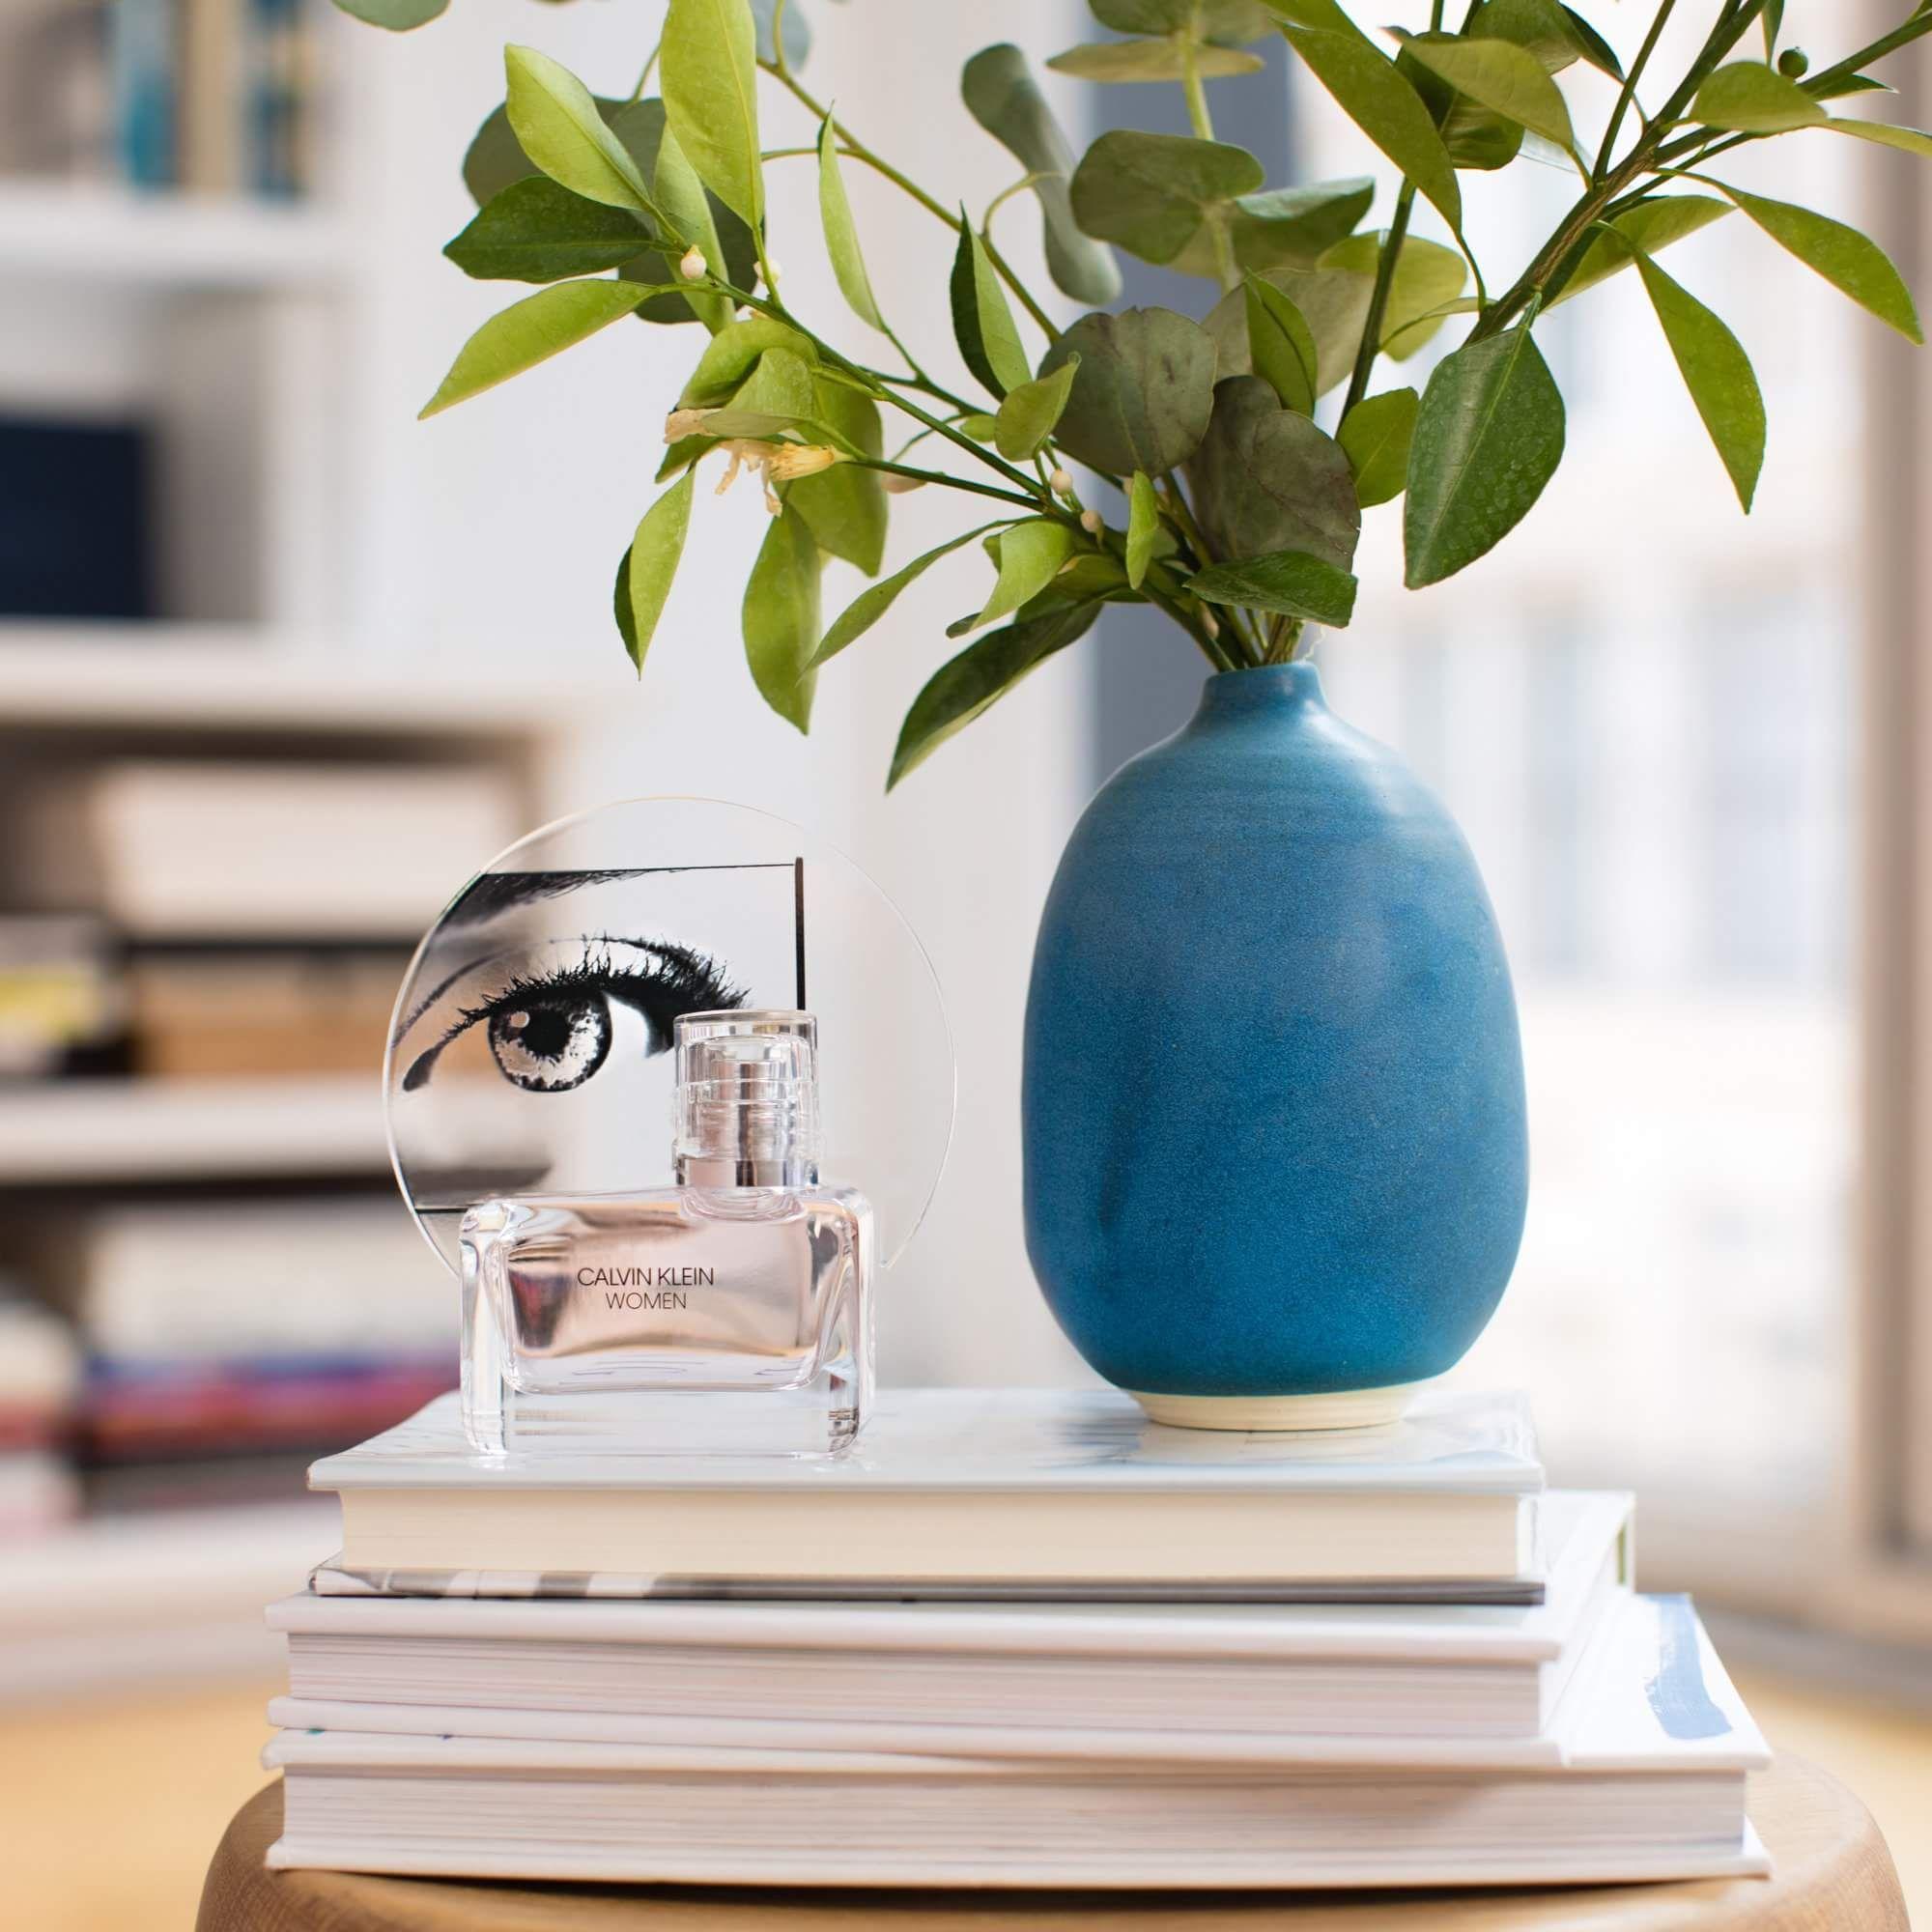 Darmowa próbka Calvin Klein Woman od iPerfumy